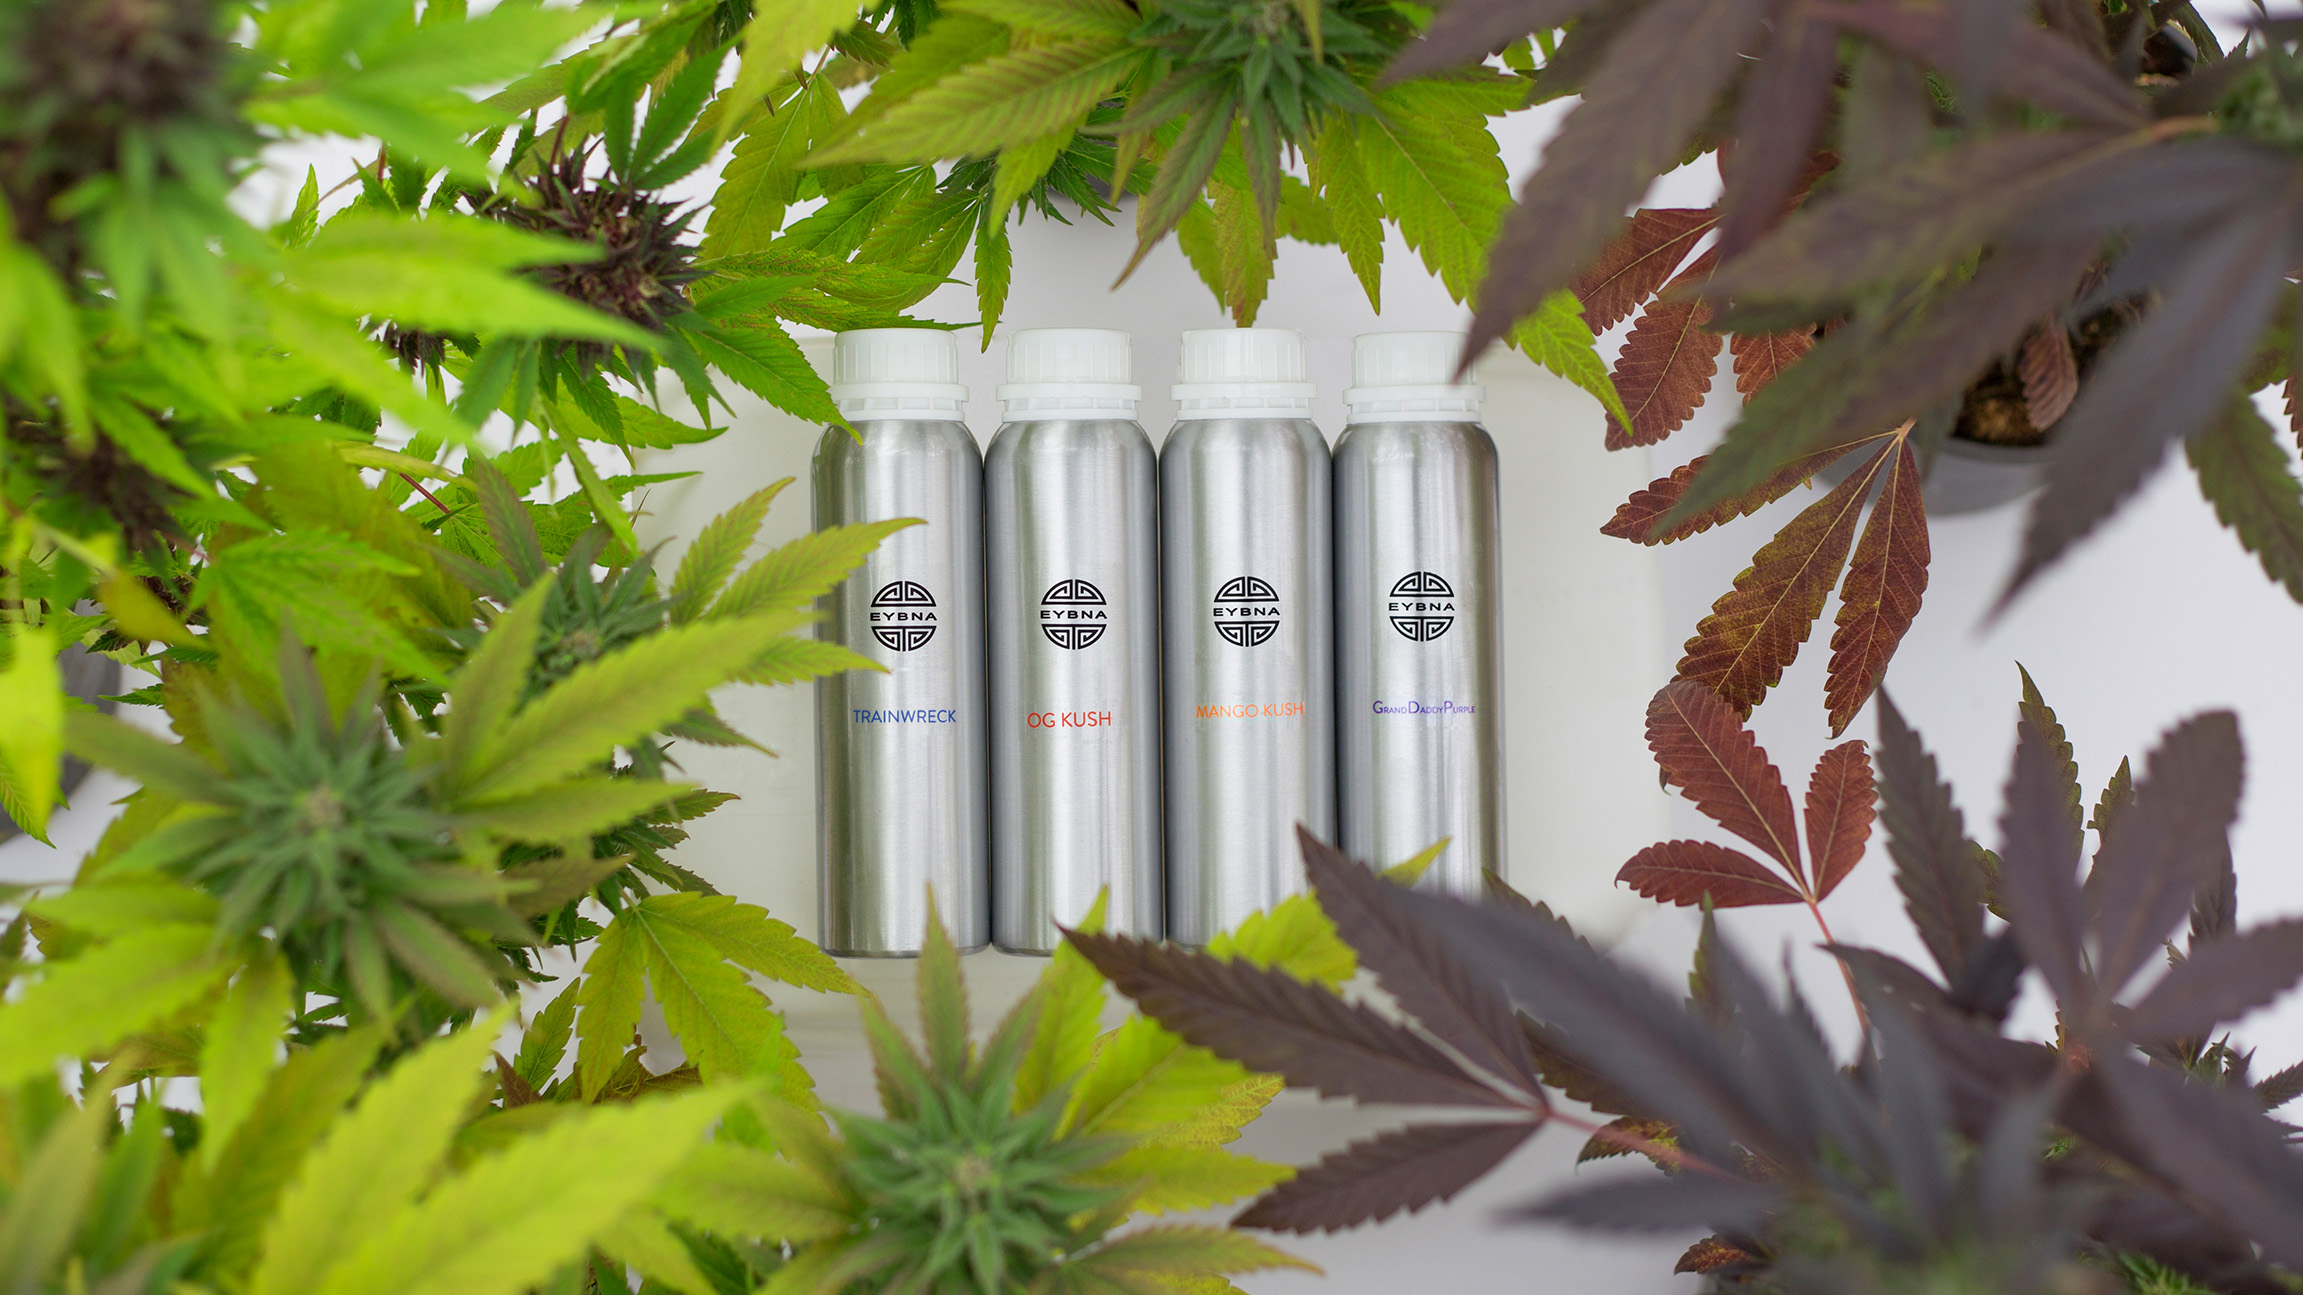 Terpene formulation cannisters